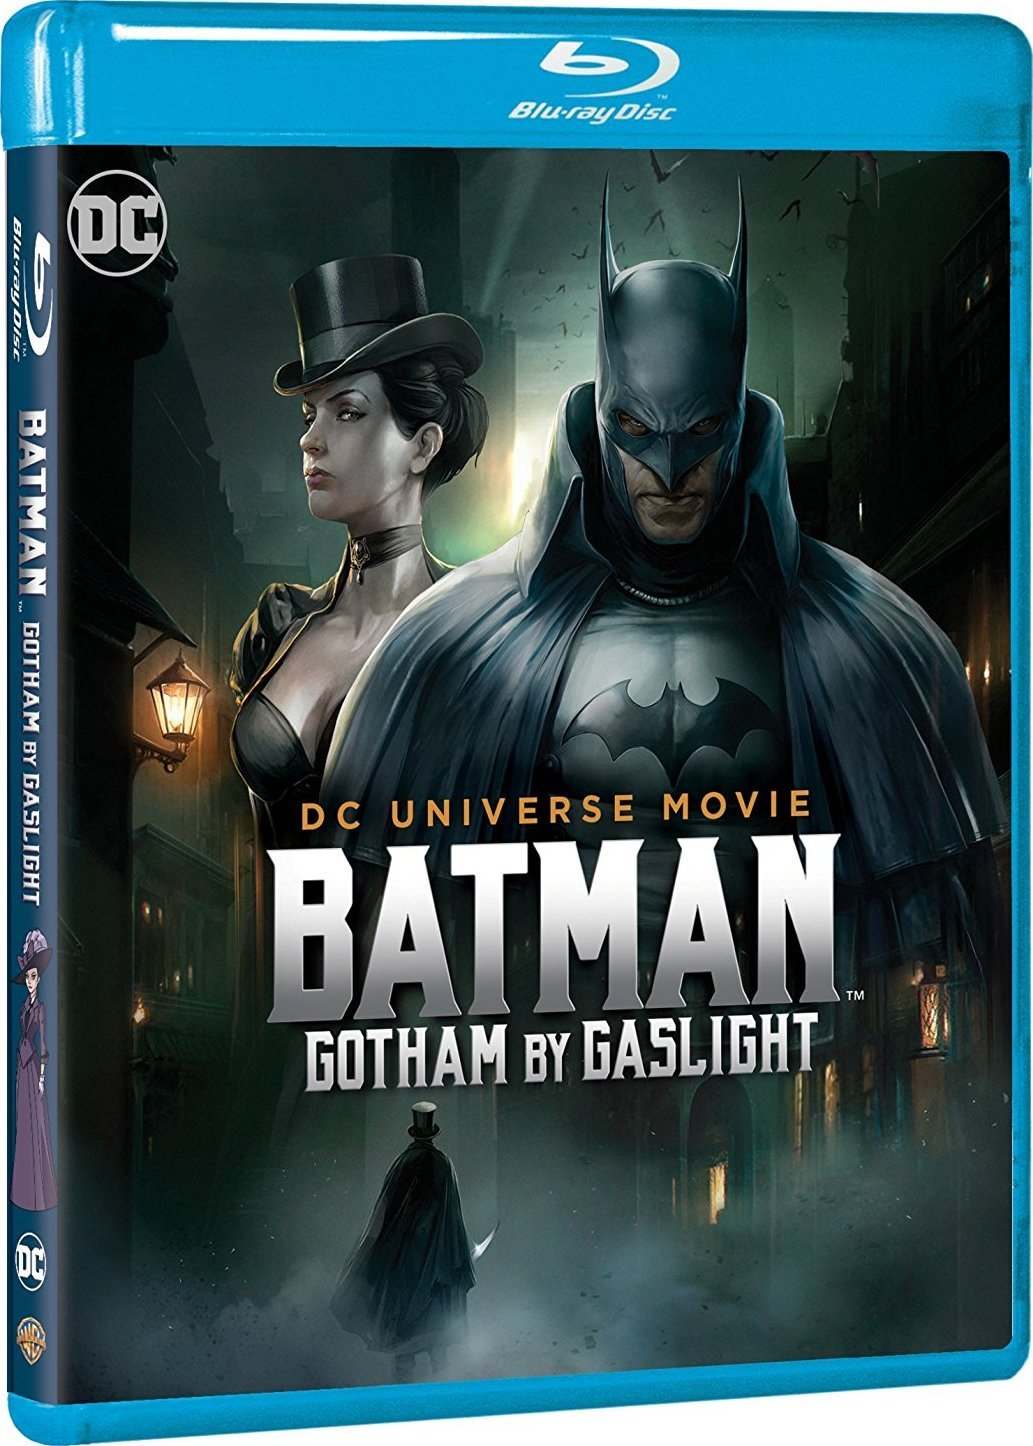 Batman Gotham by Gaslight 2018 2160p UHD HDR BluRay